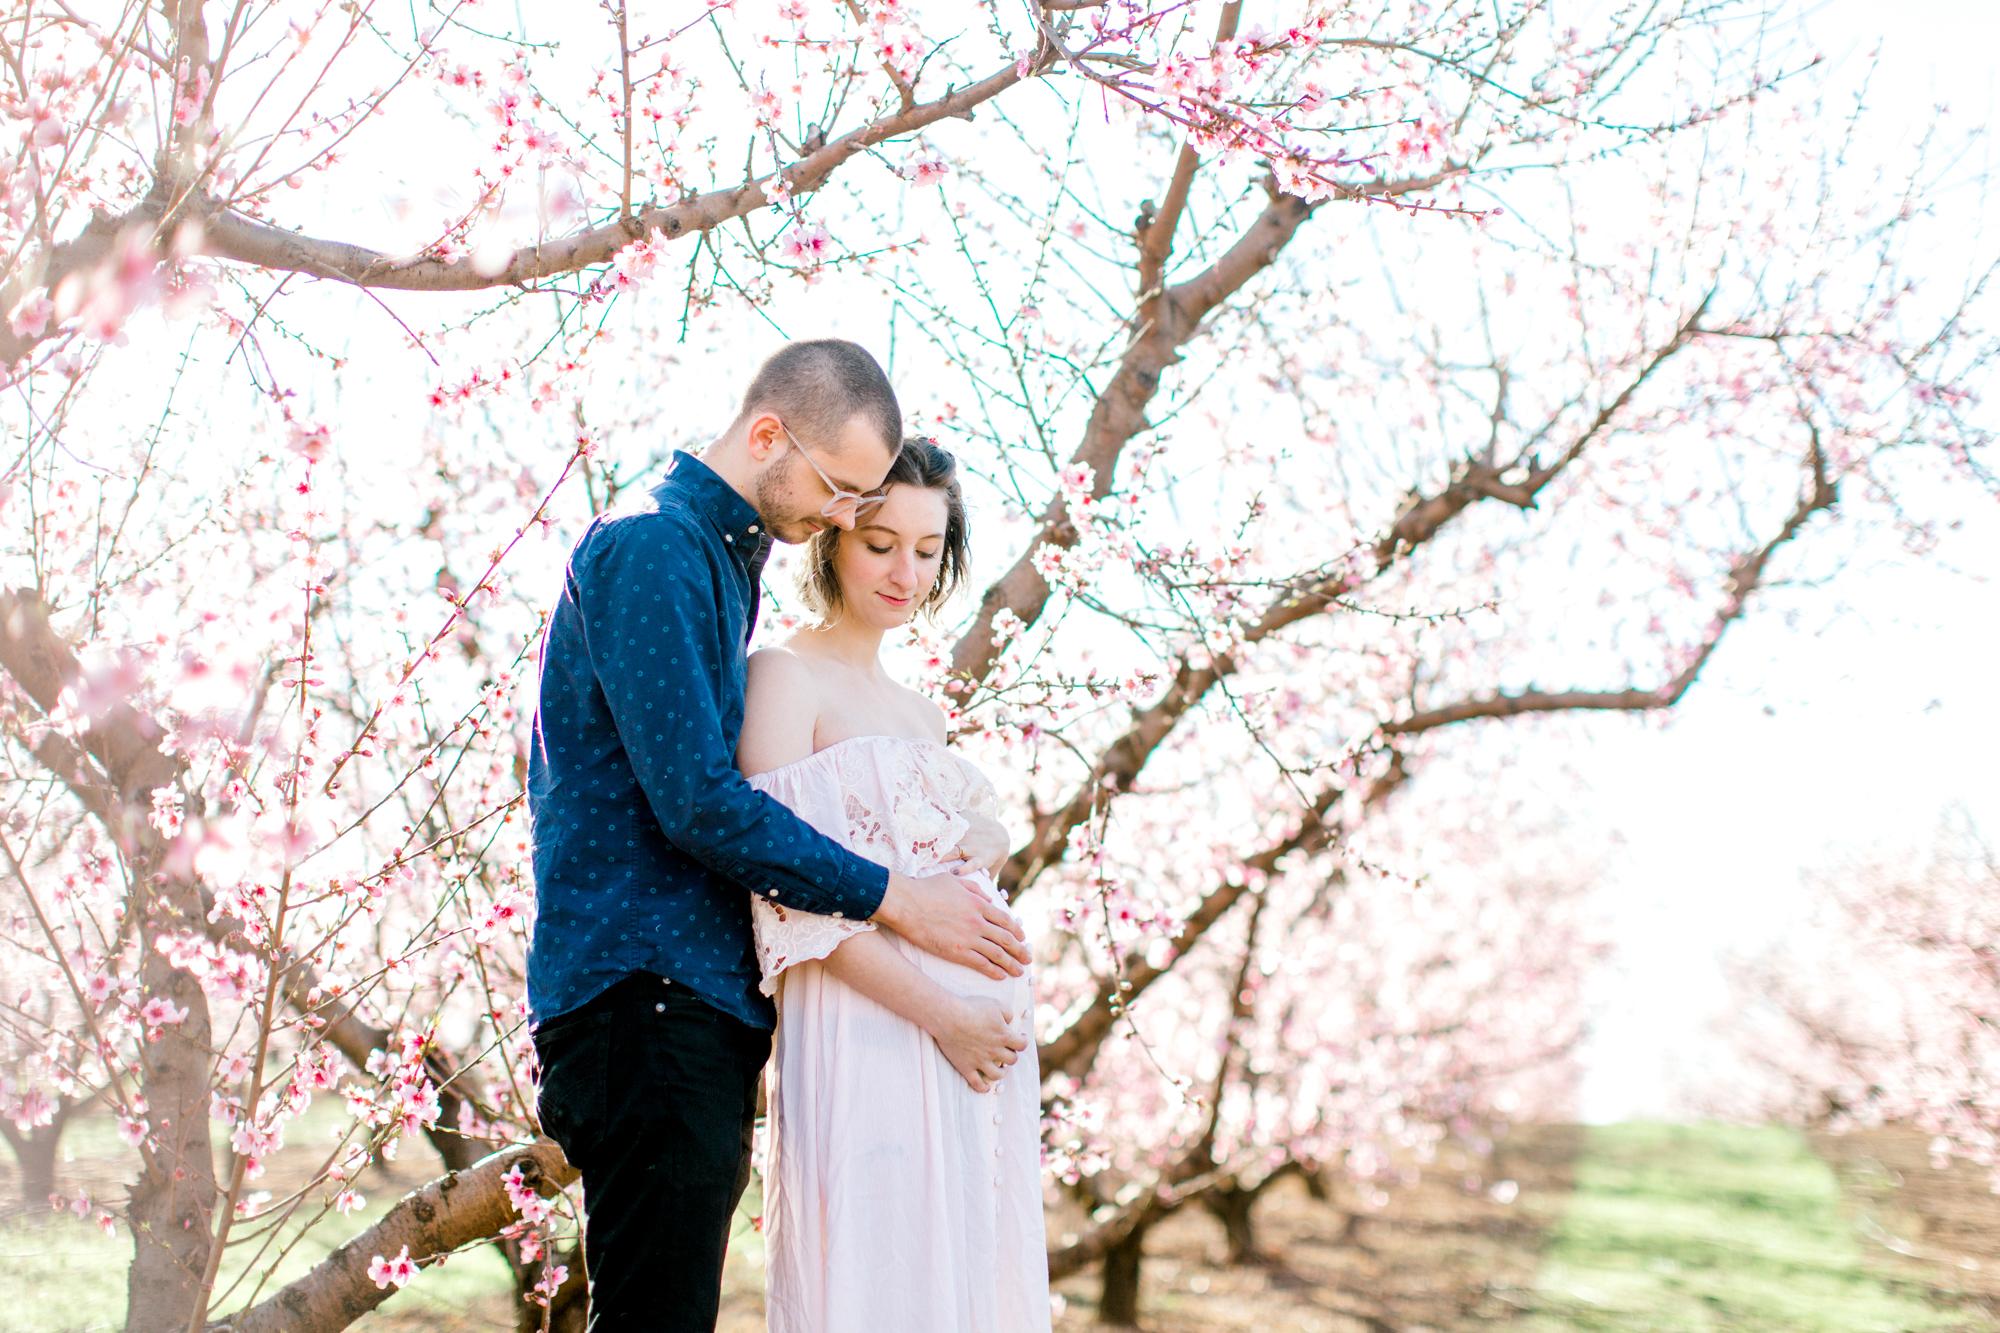 four corners photography peach blossom mini sessions peach blossom maternity session (7 of 25).jpg